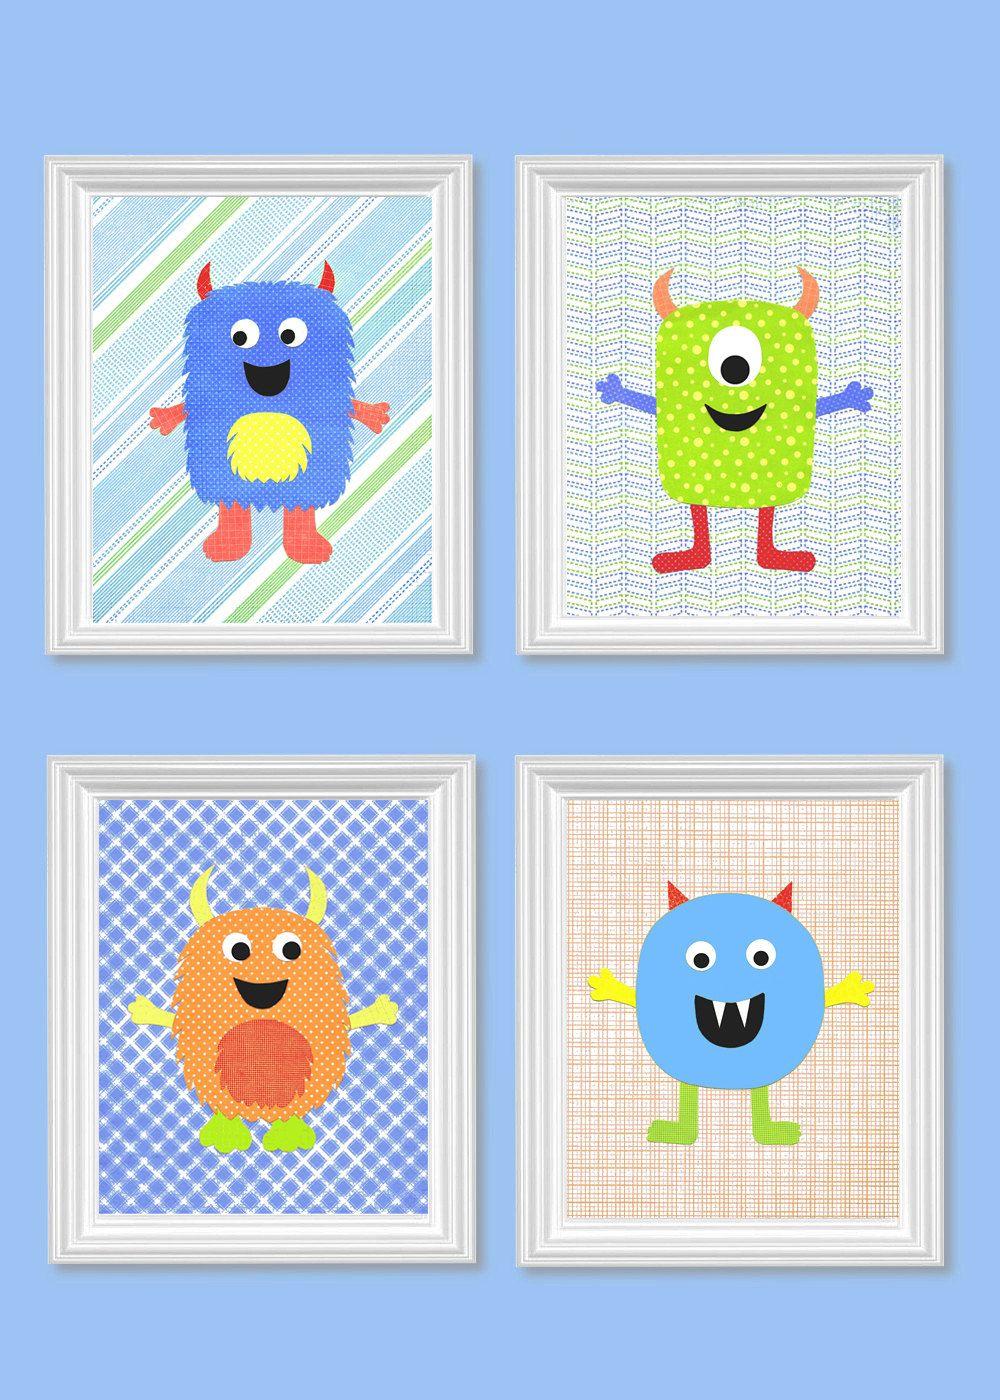 Https Www Etsy Es Listing 159804626 Monster Nursery Decor Neon Blue Green Ref Related 6